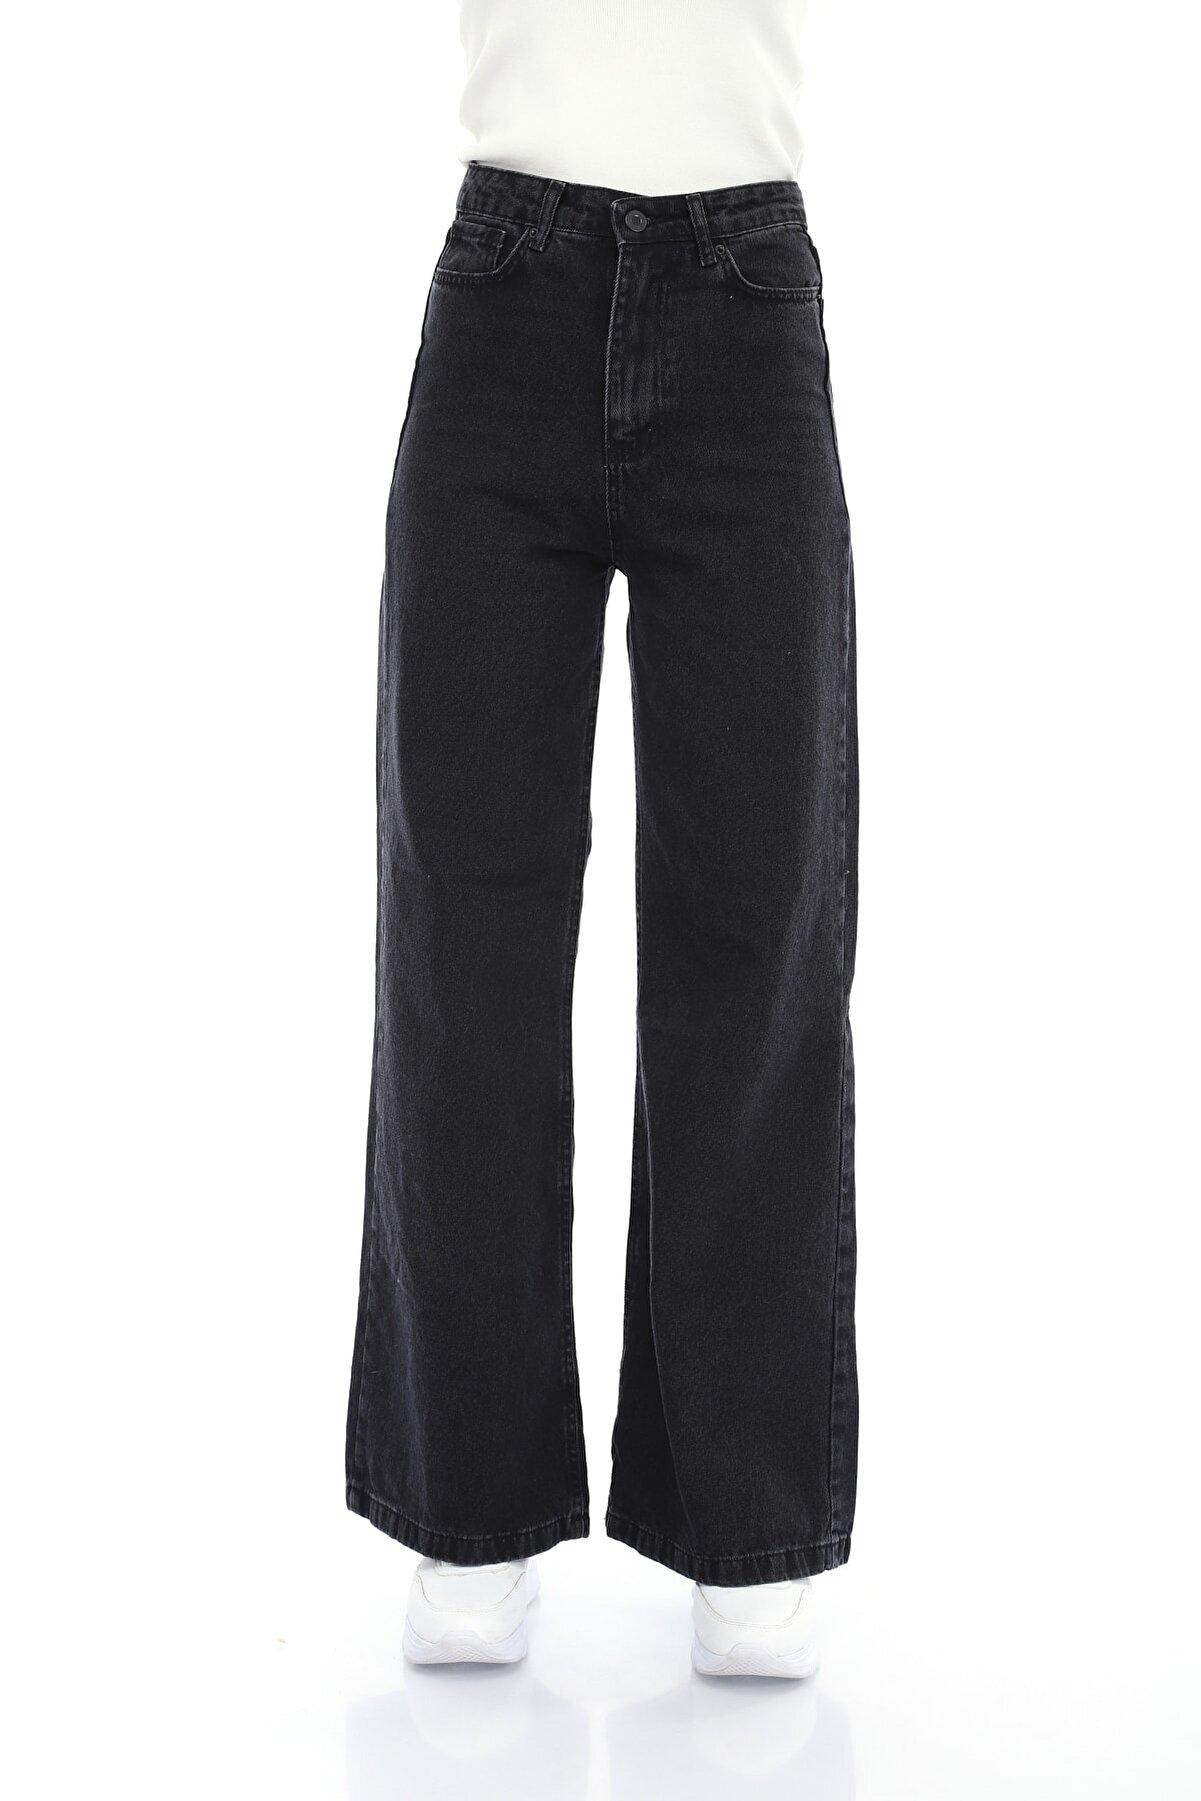 Meissa Füme Bol Paça Jeans